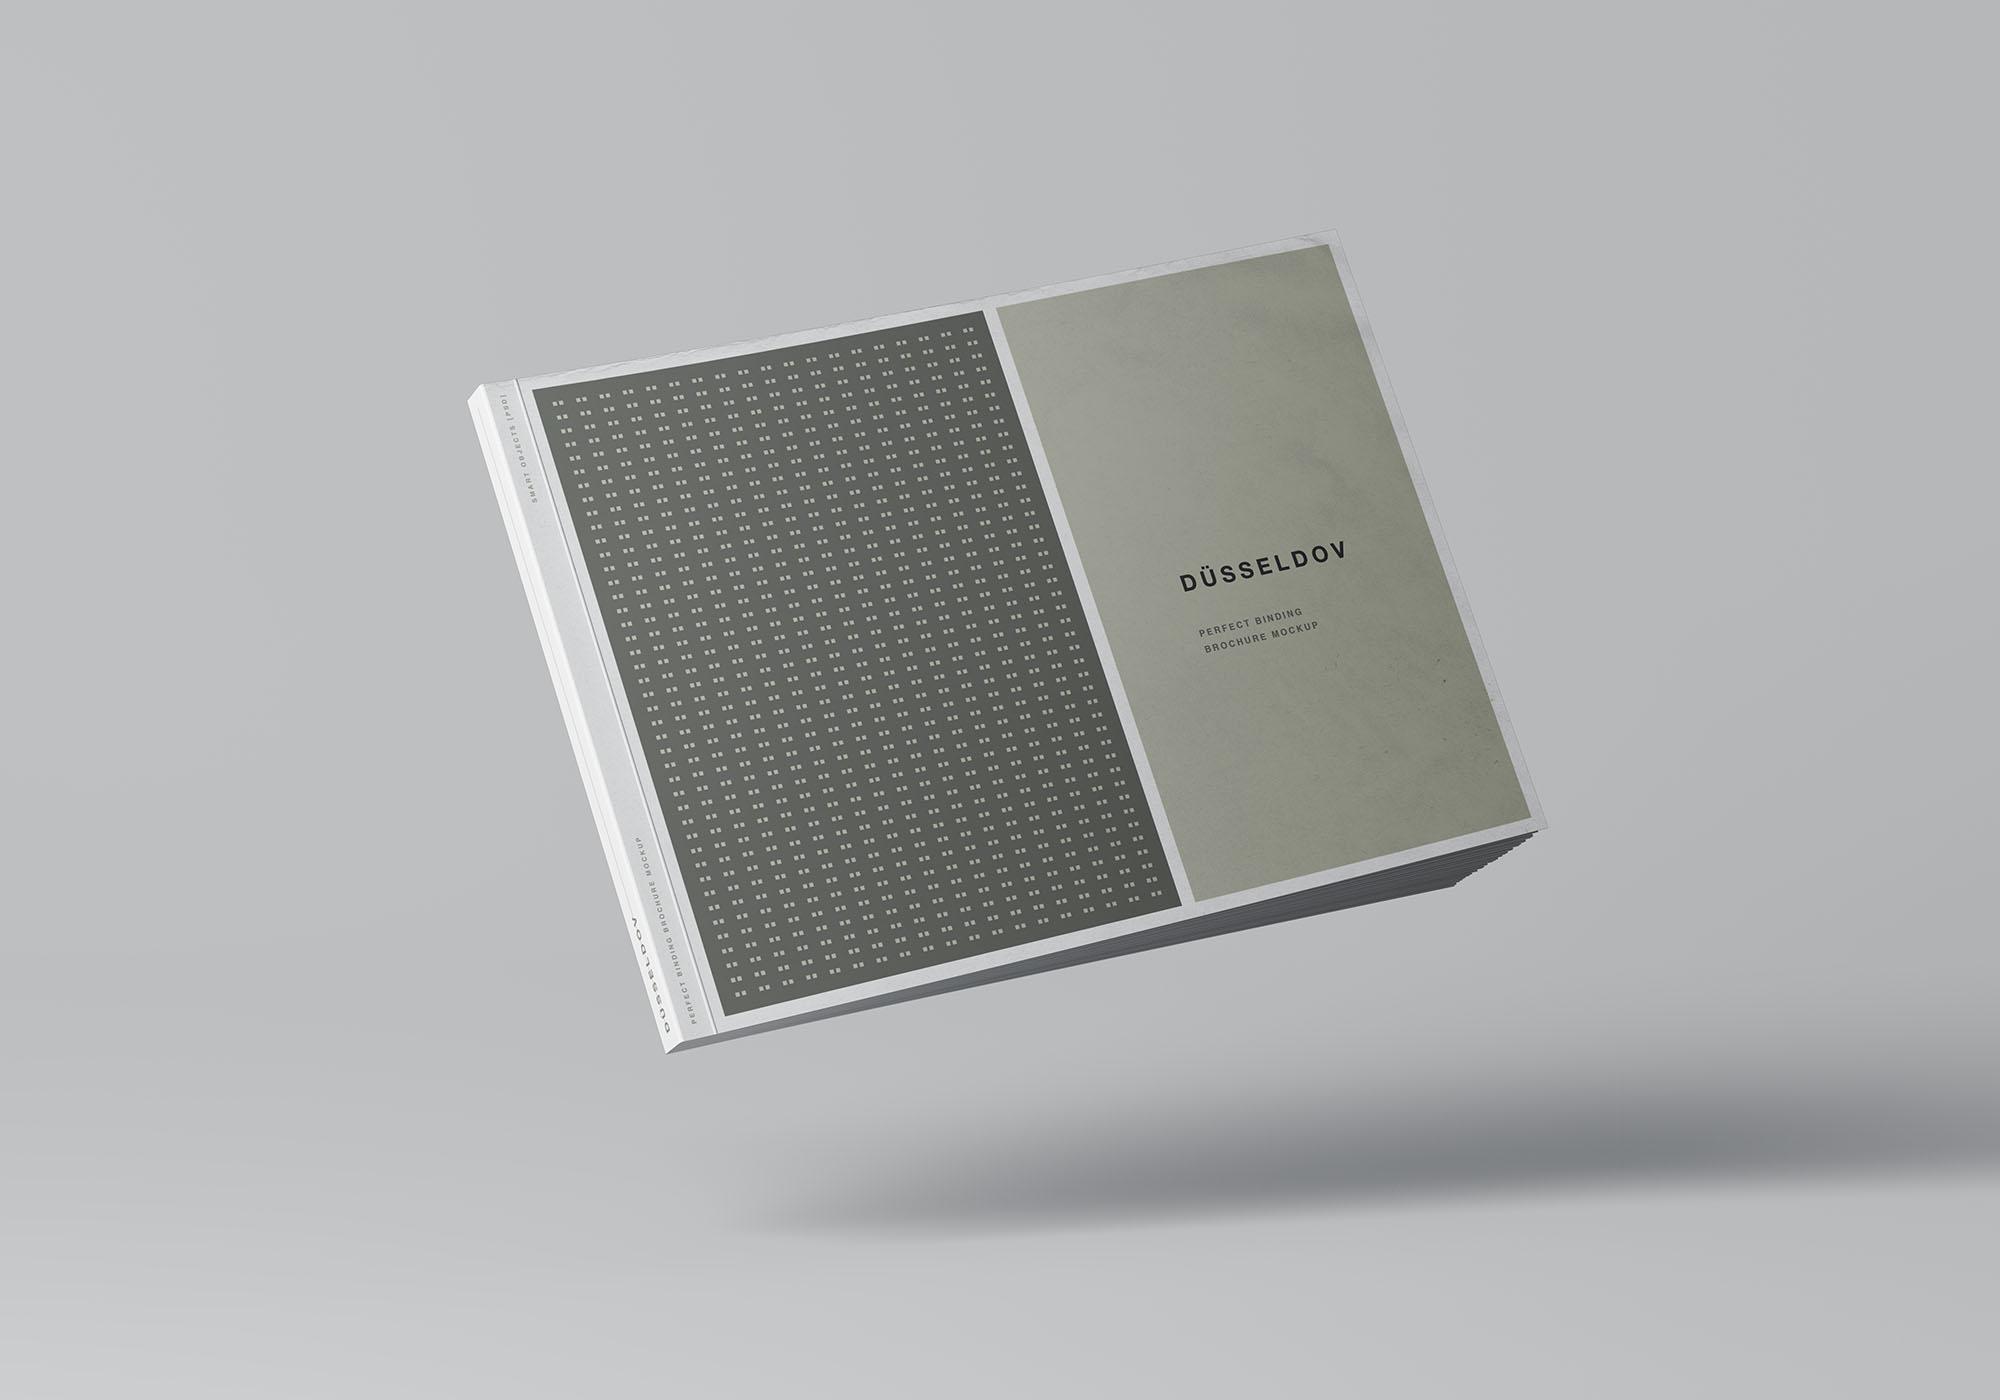 A4书籍画册杂志设计效果图样机模板 A4 Landscape Perfect Binding Brochure Mockup插图(5)